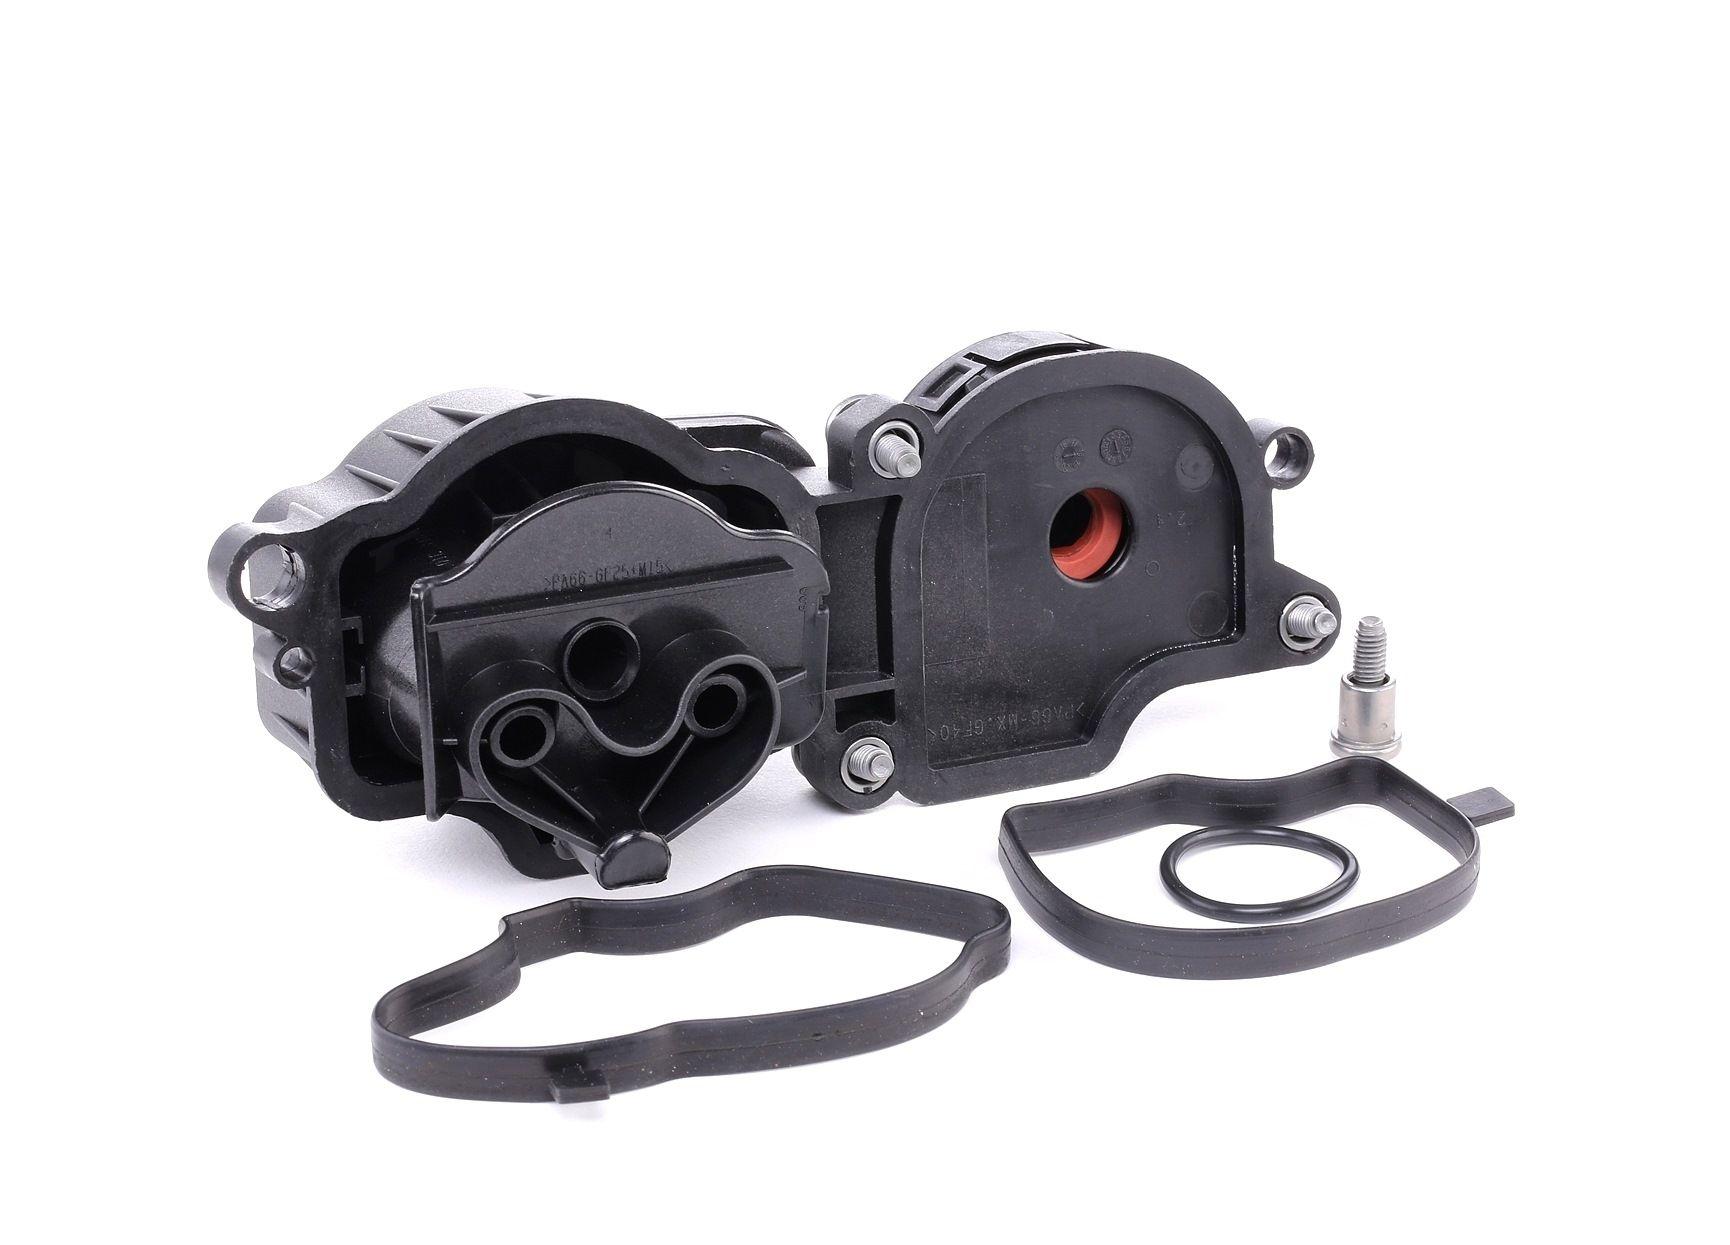 Valve, engine block breather RIDEX 3886V0009 rating